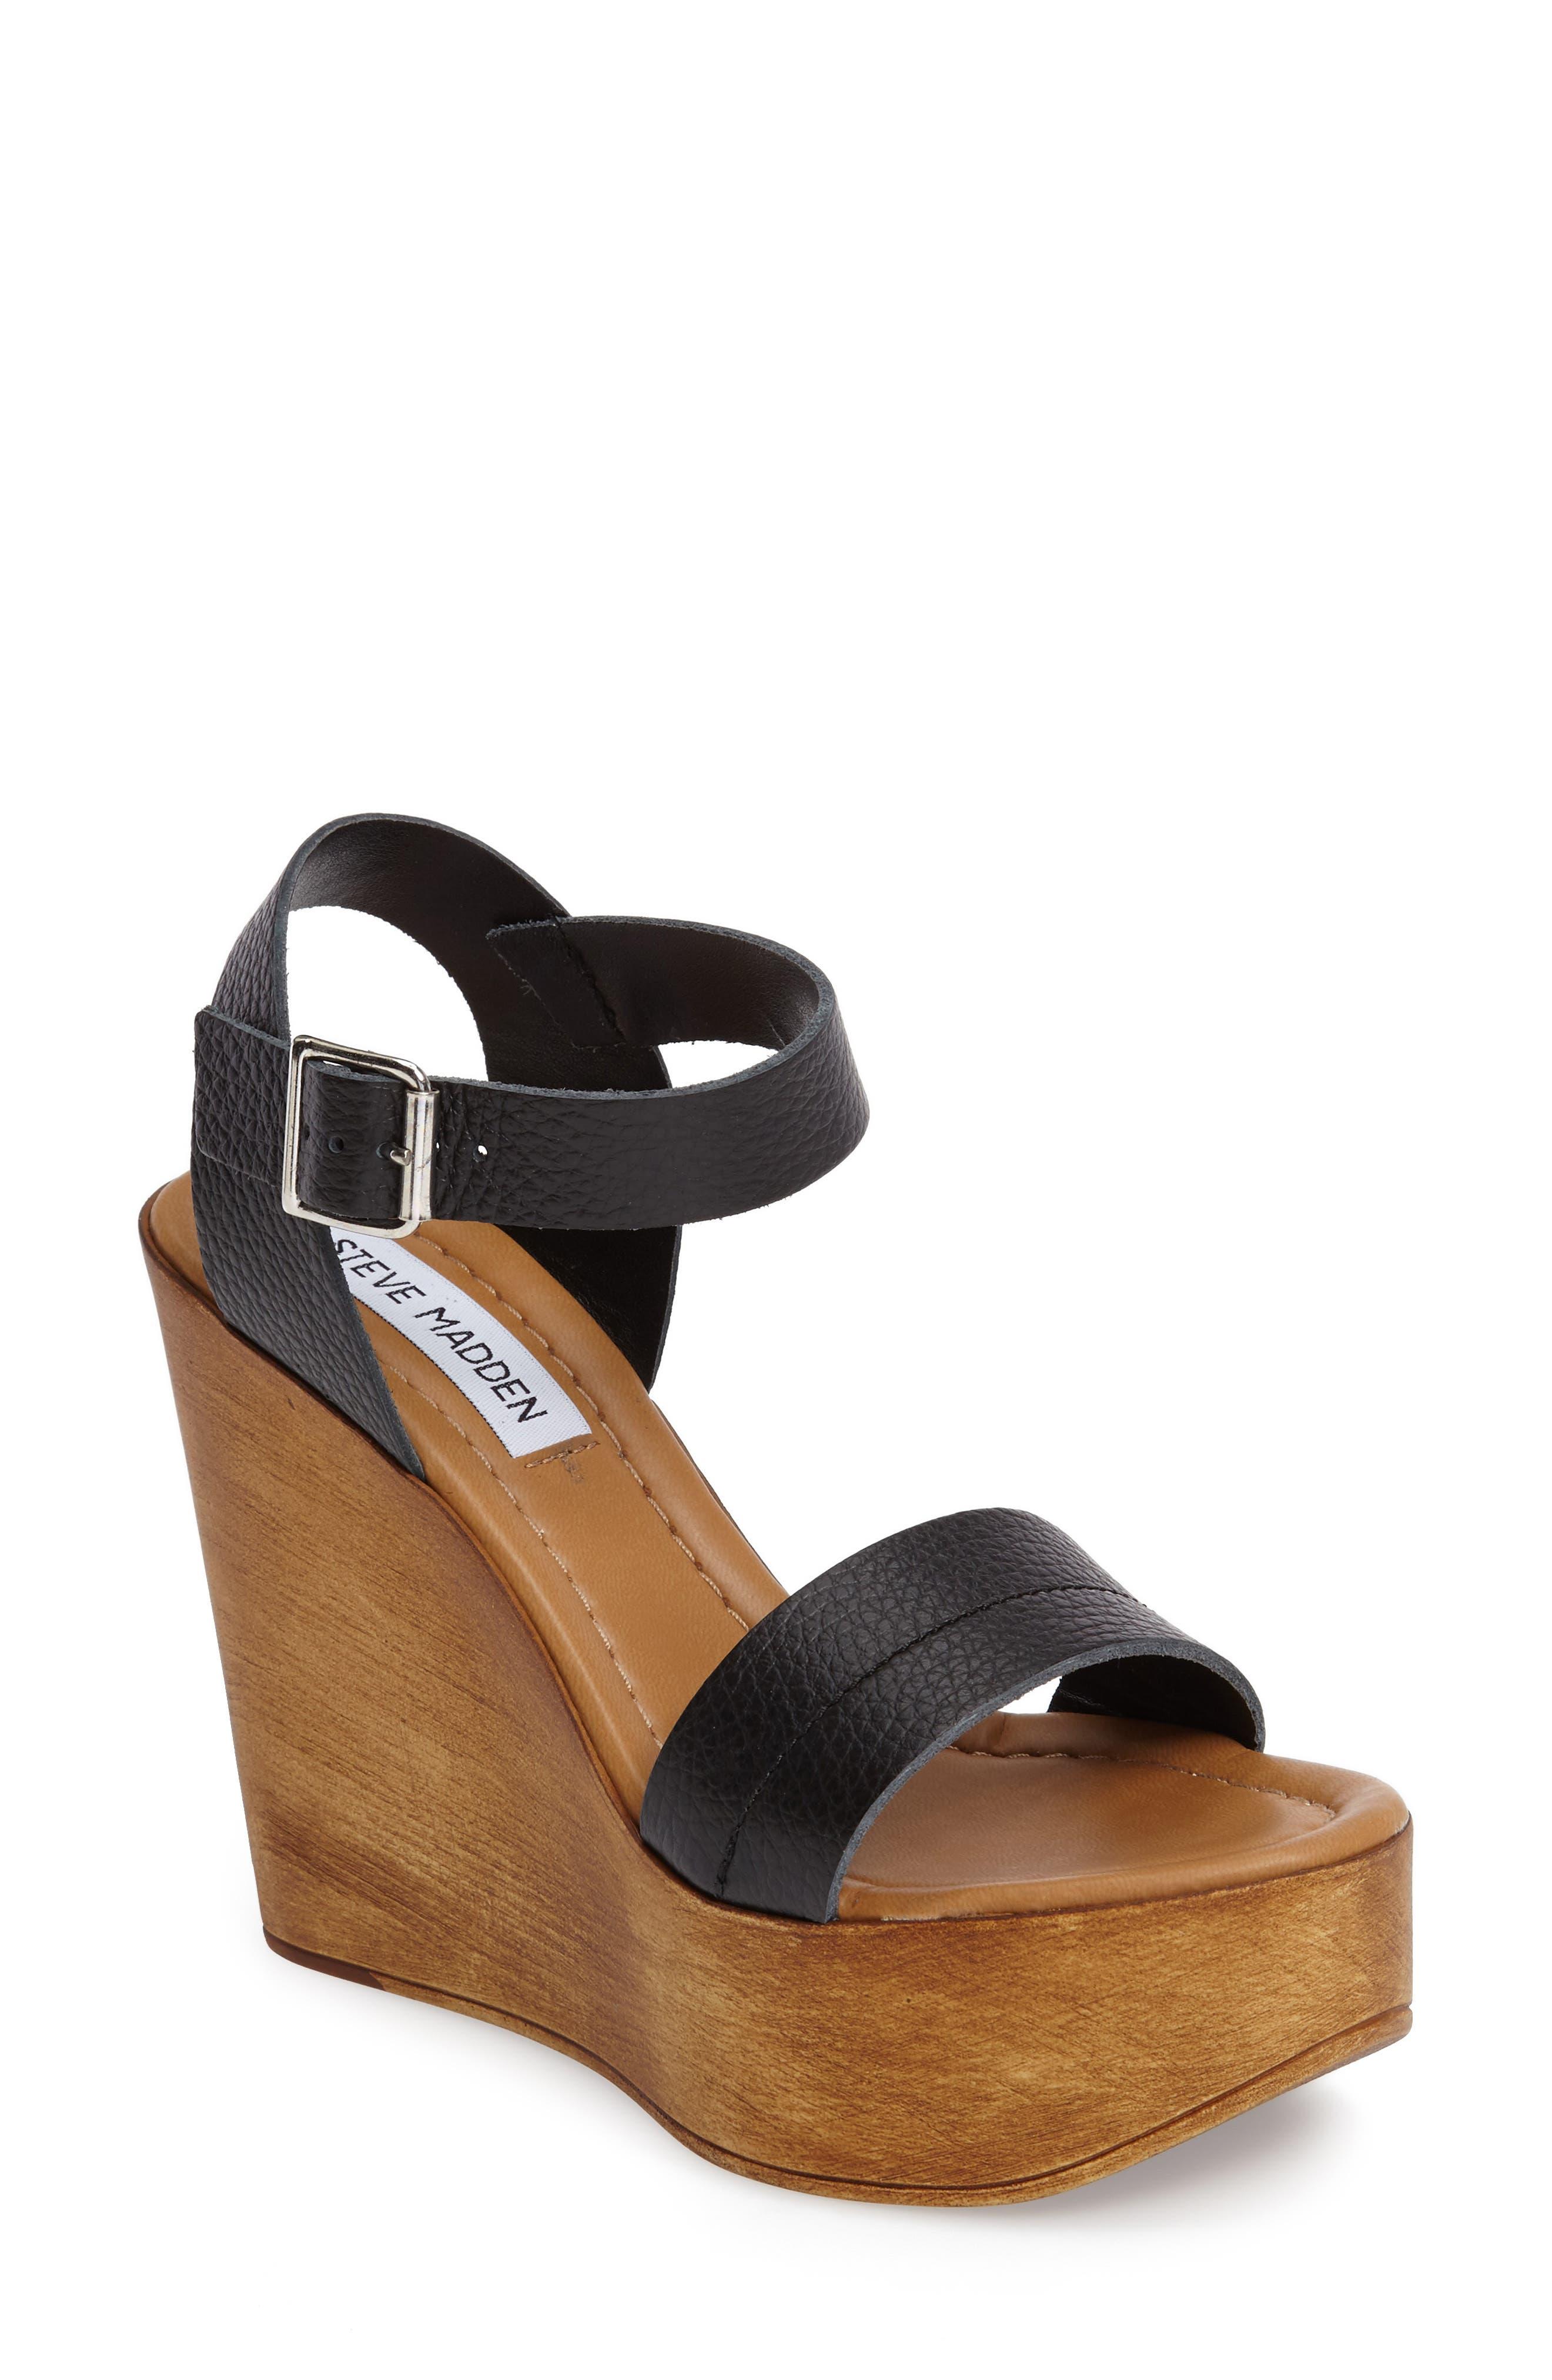 Belma Wedge Sandal,                         Main,                         color, Black Leather